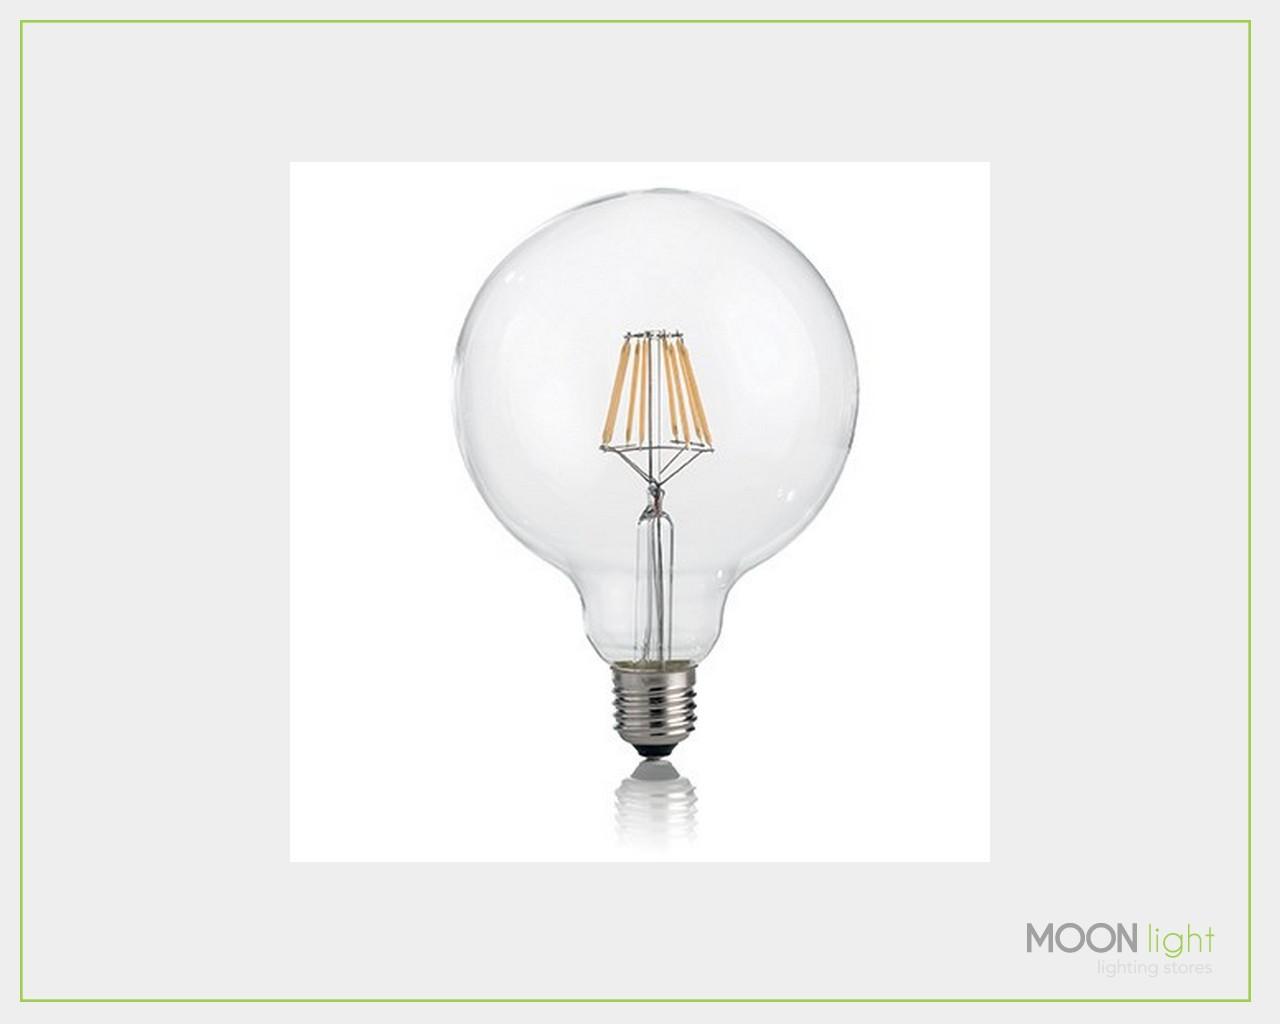 Led risparmio energetico illuminazione led negozi for Risparmio energetico led